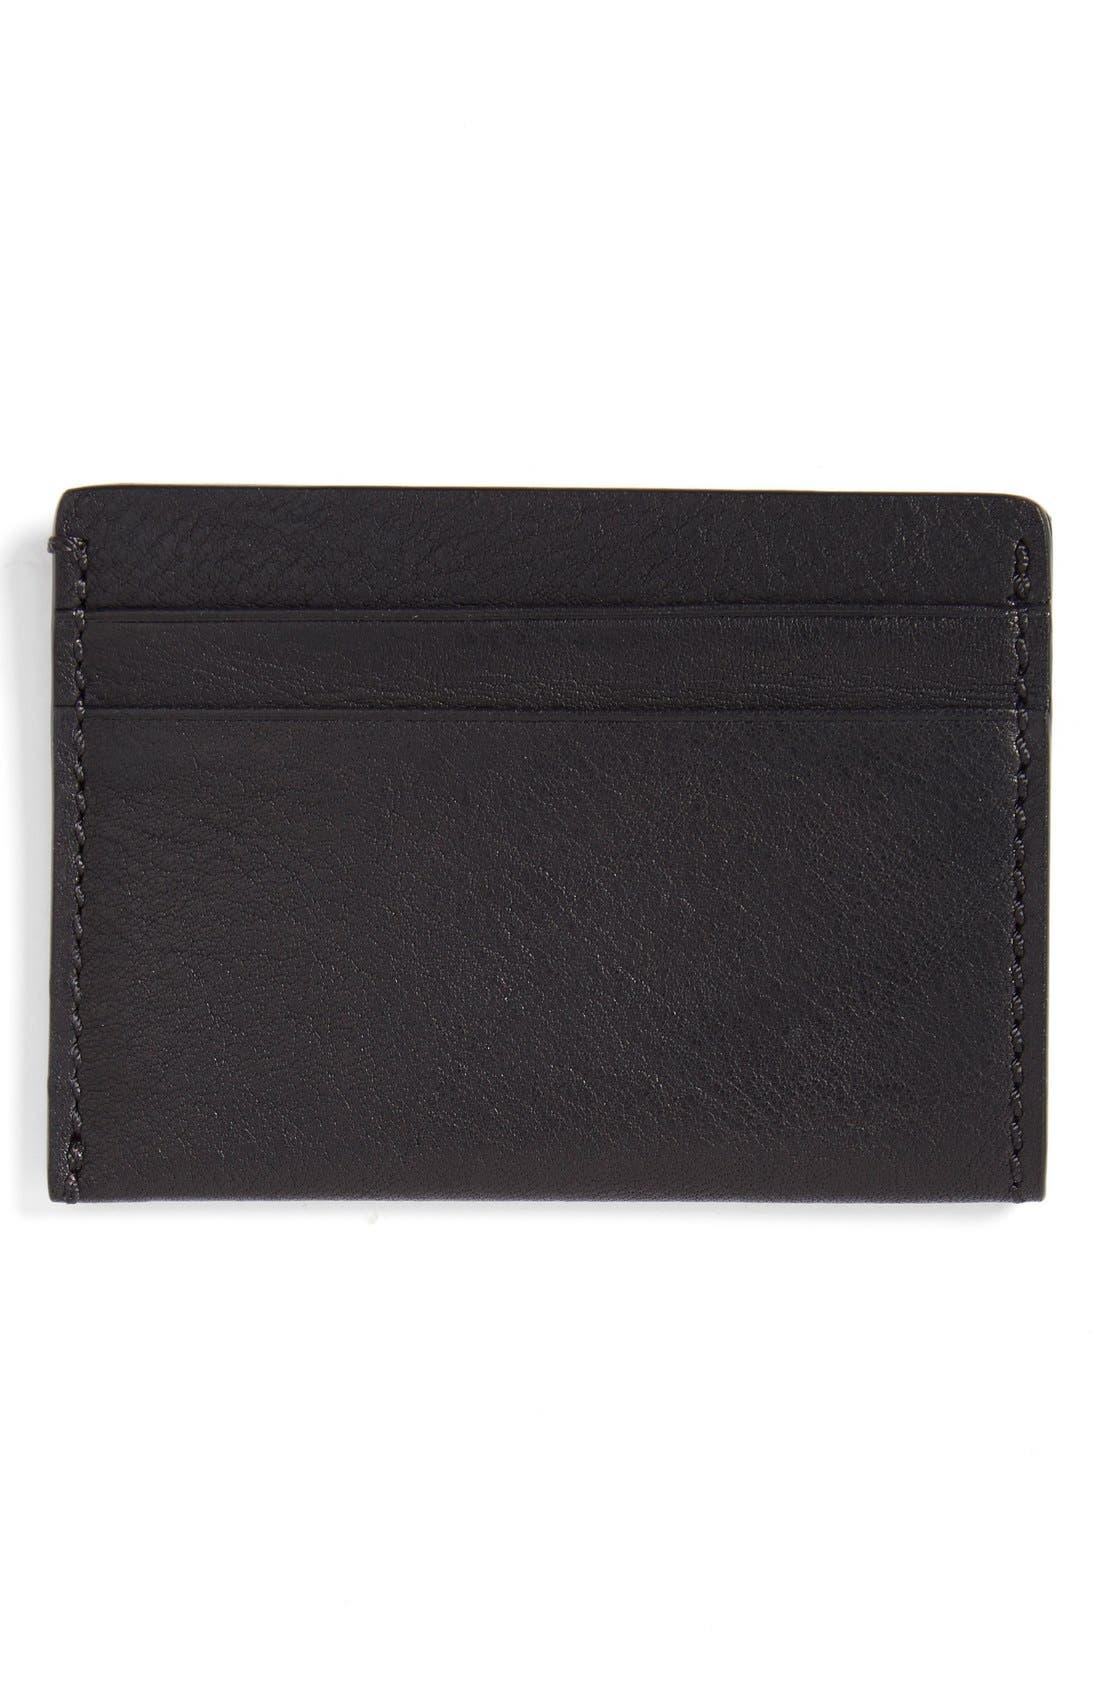 BOSCA,                             Leather Card Case,                             Alternate thumbnail 2, color,                             BLACK